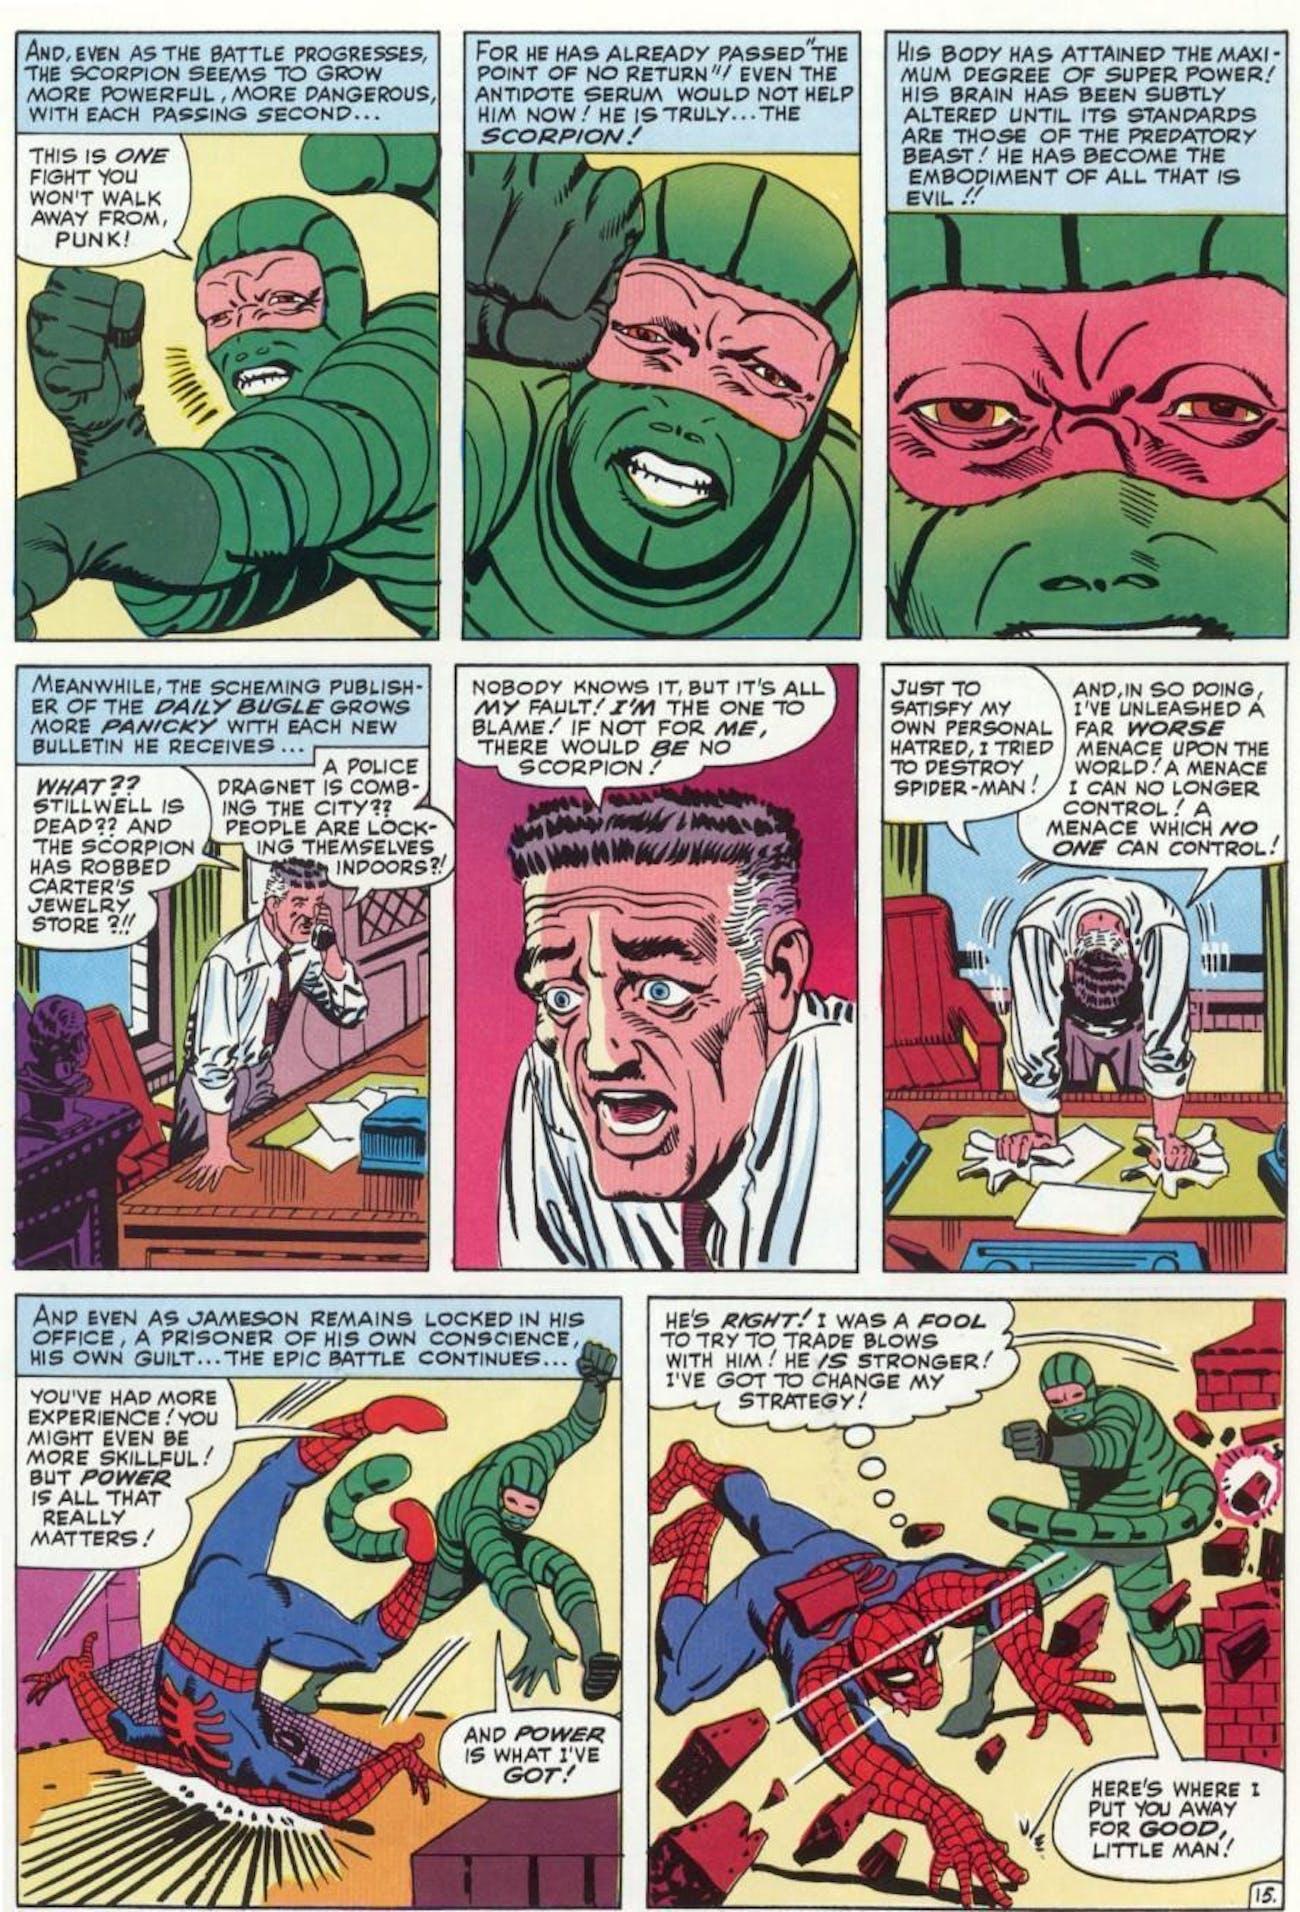 Scorpion Marvel Homecoming Spider-Man